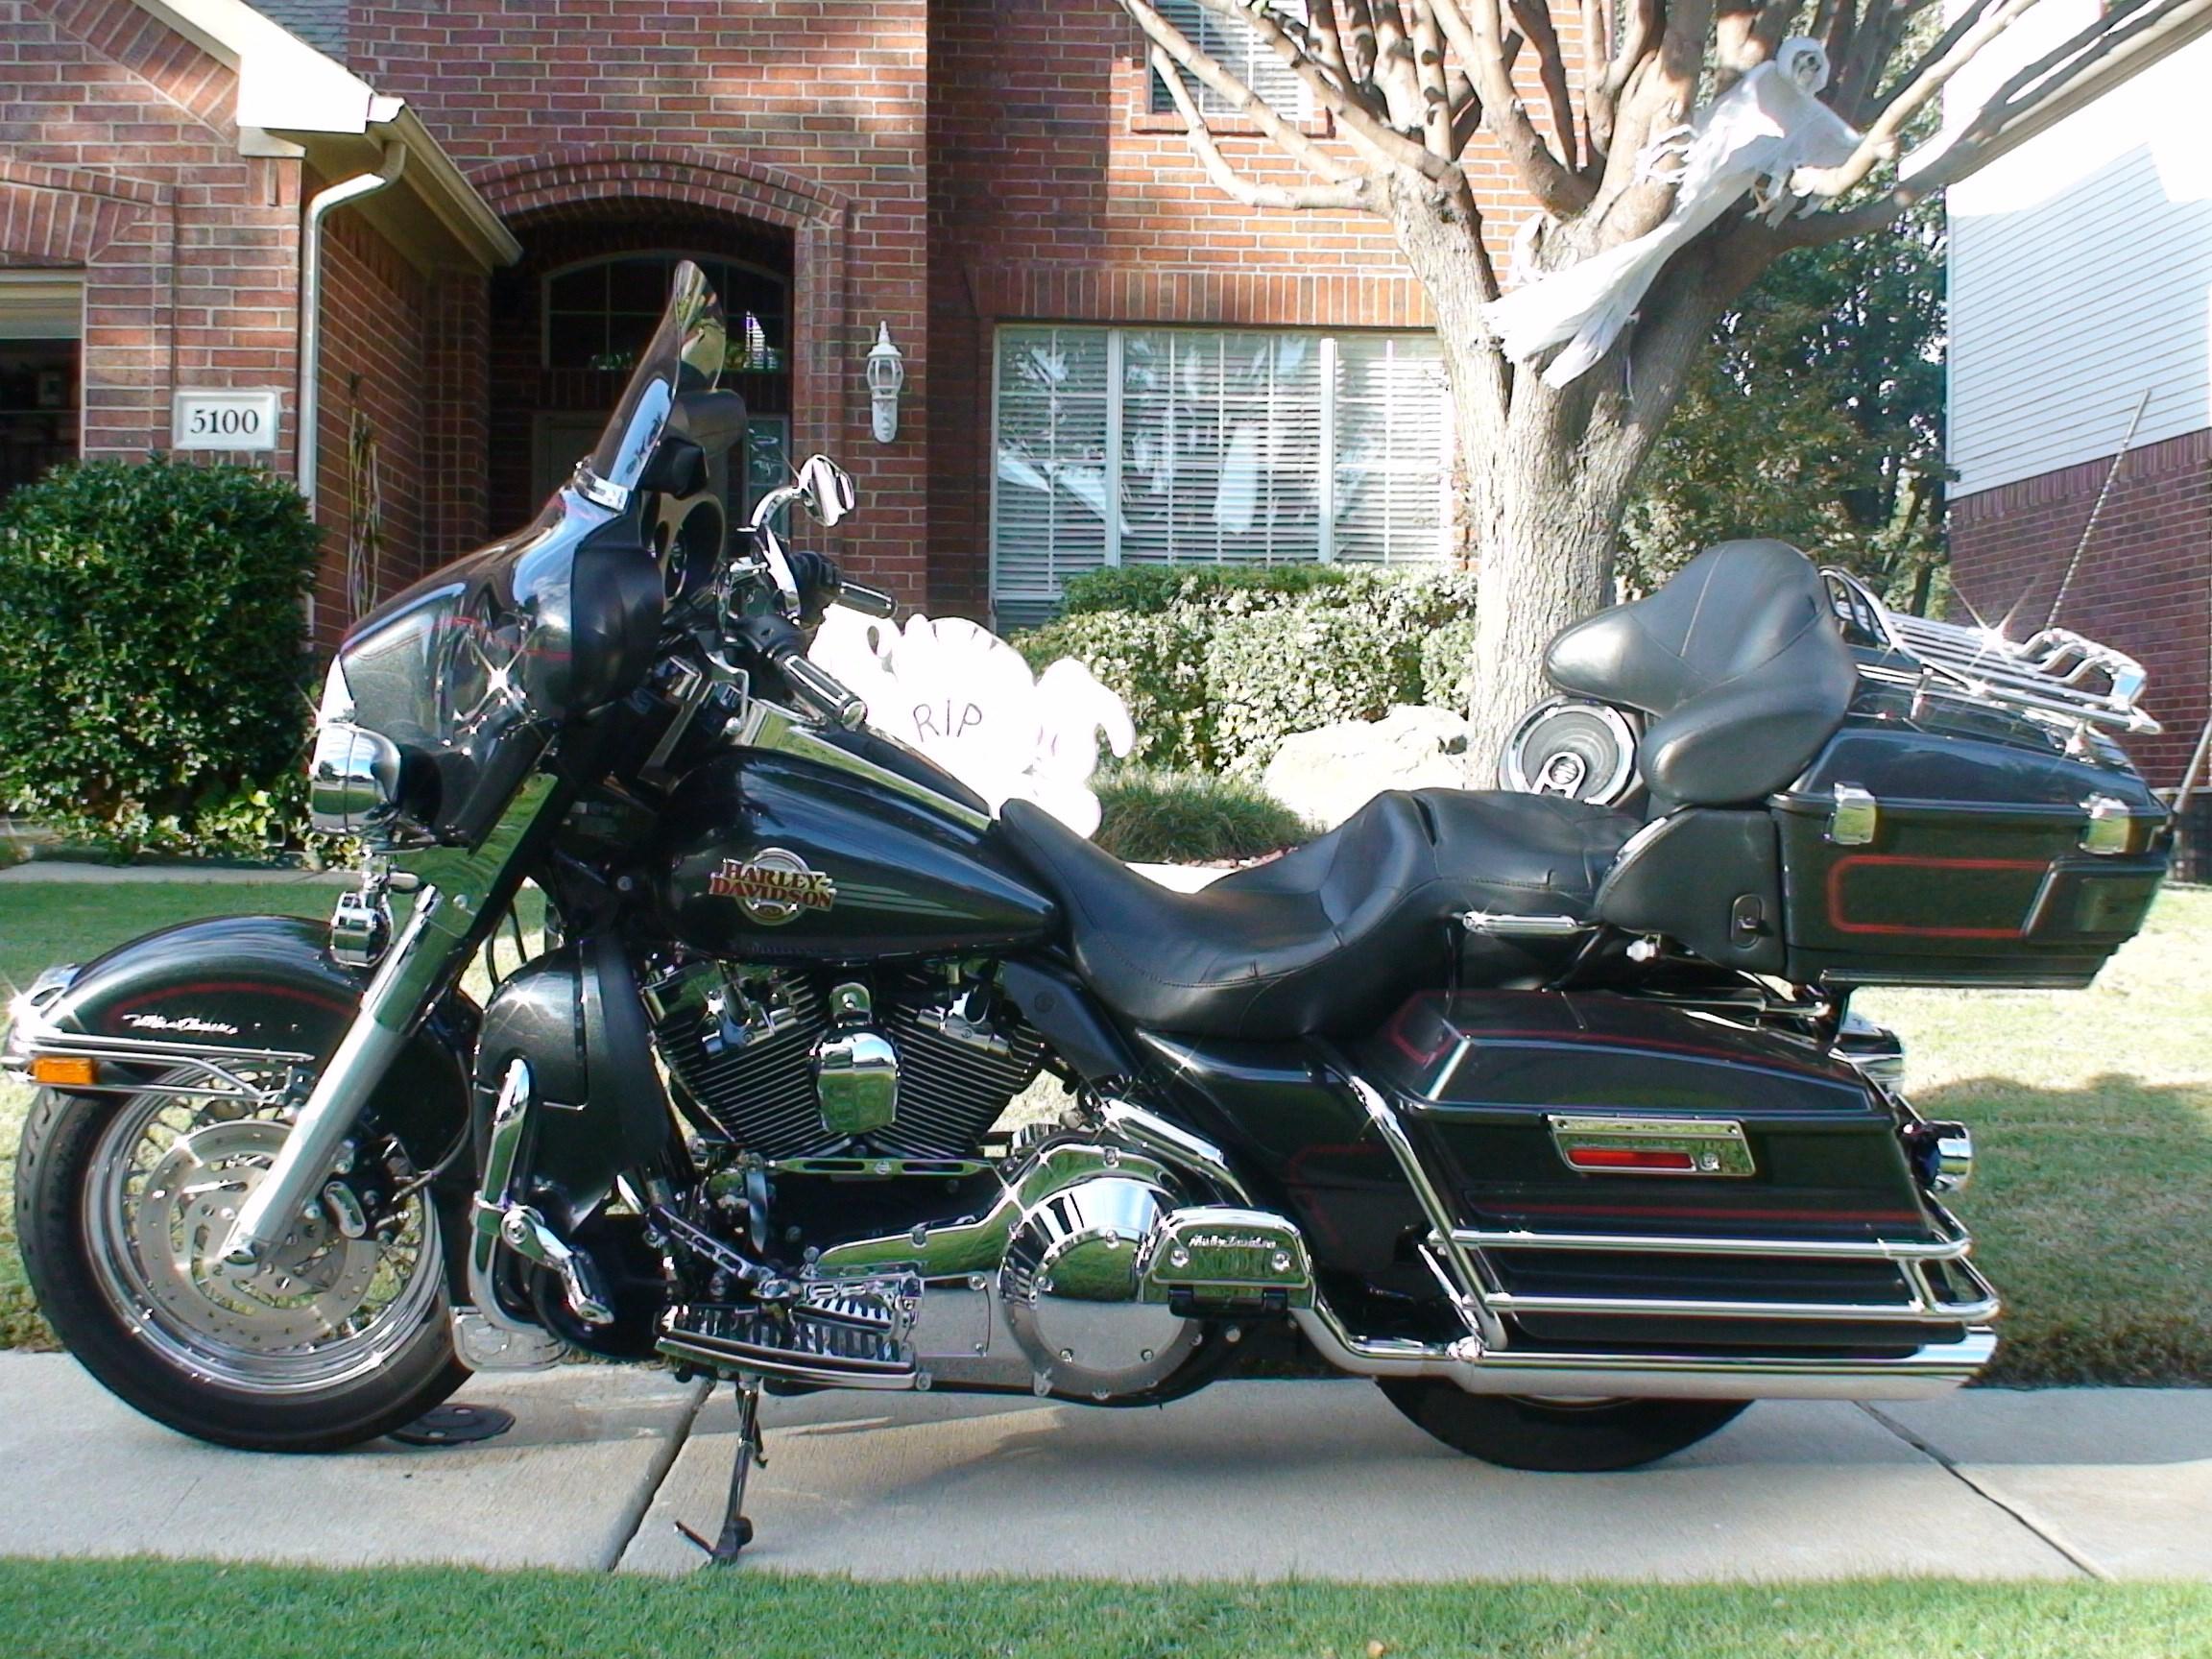 2006 Harley Davidson 174 Flhtcu I Electra Glide 174 Ultra